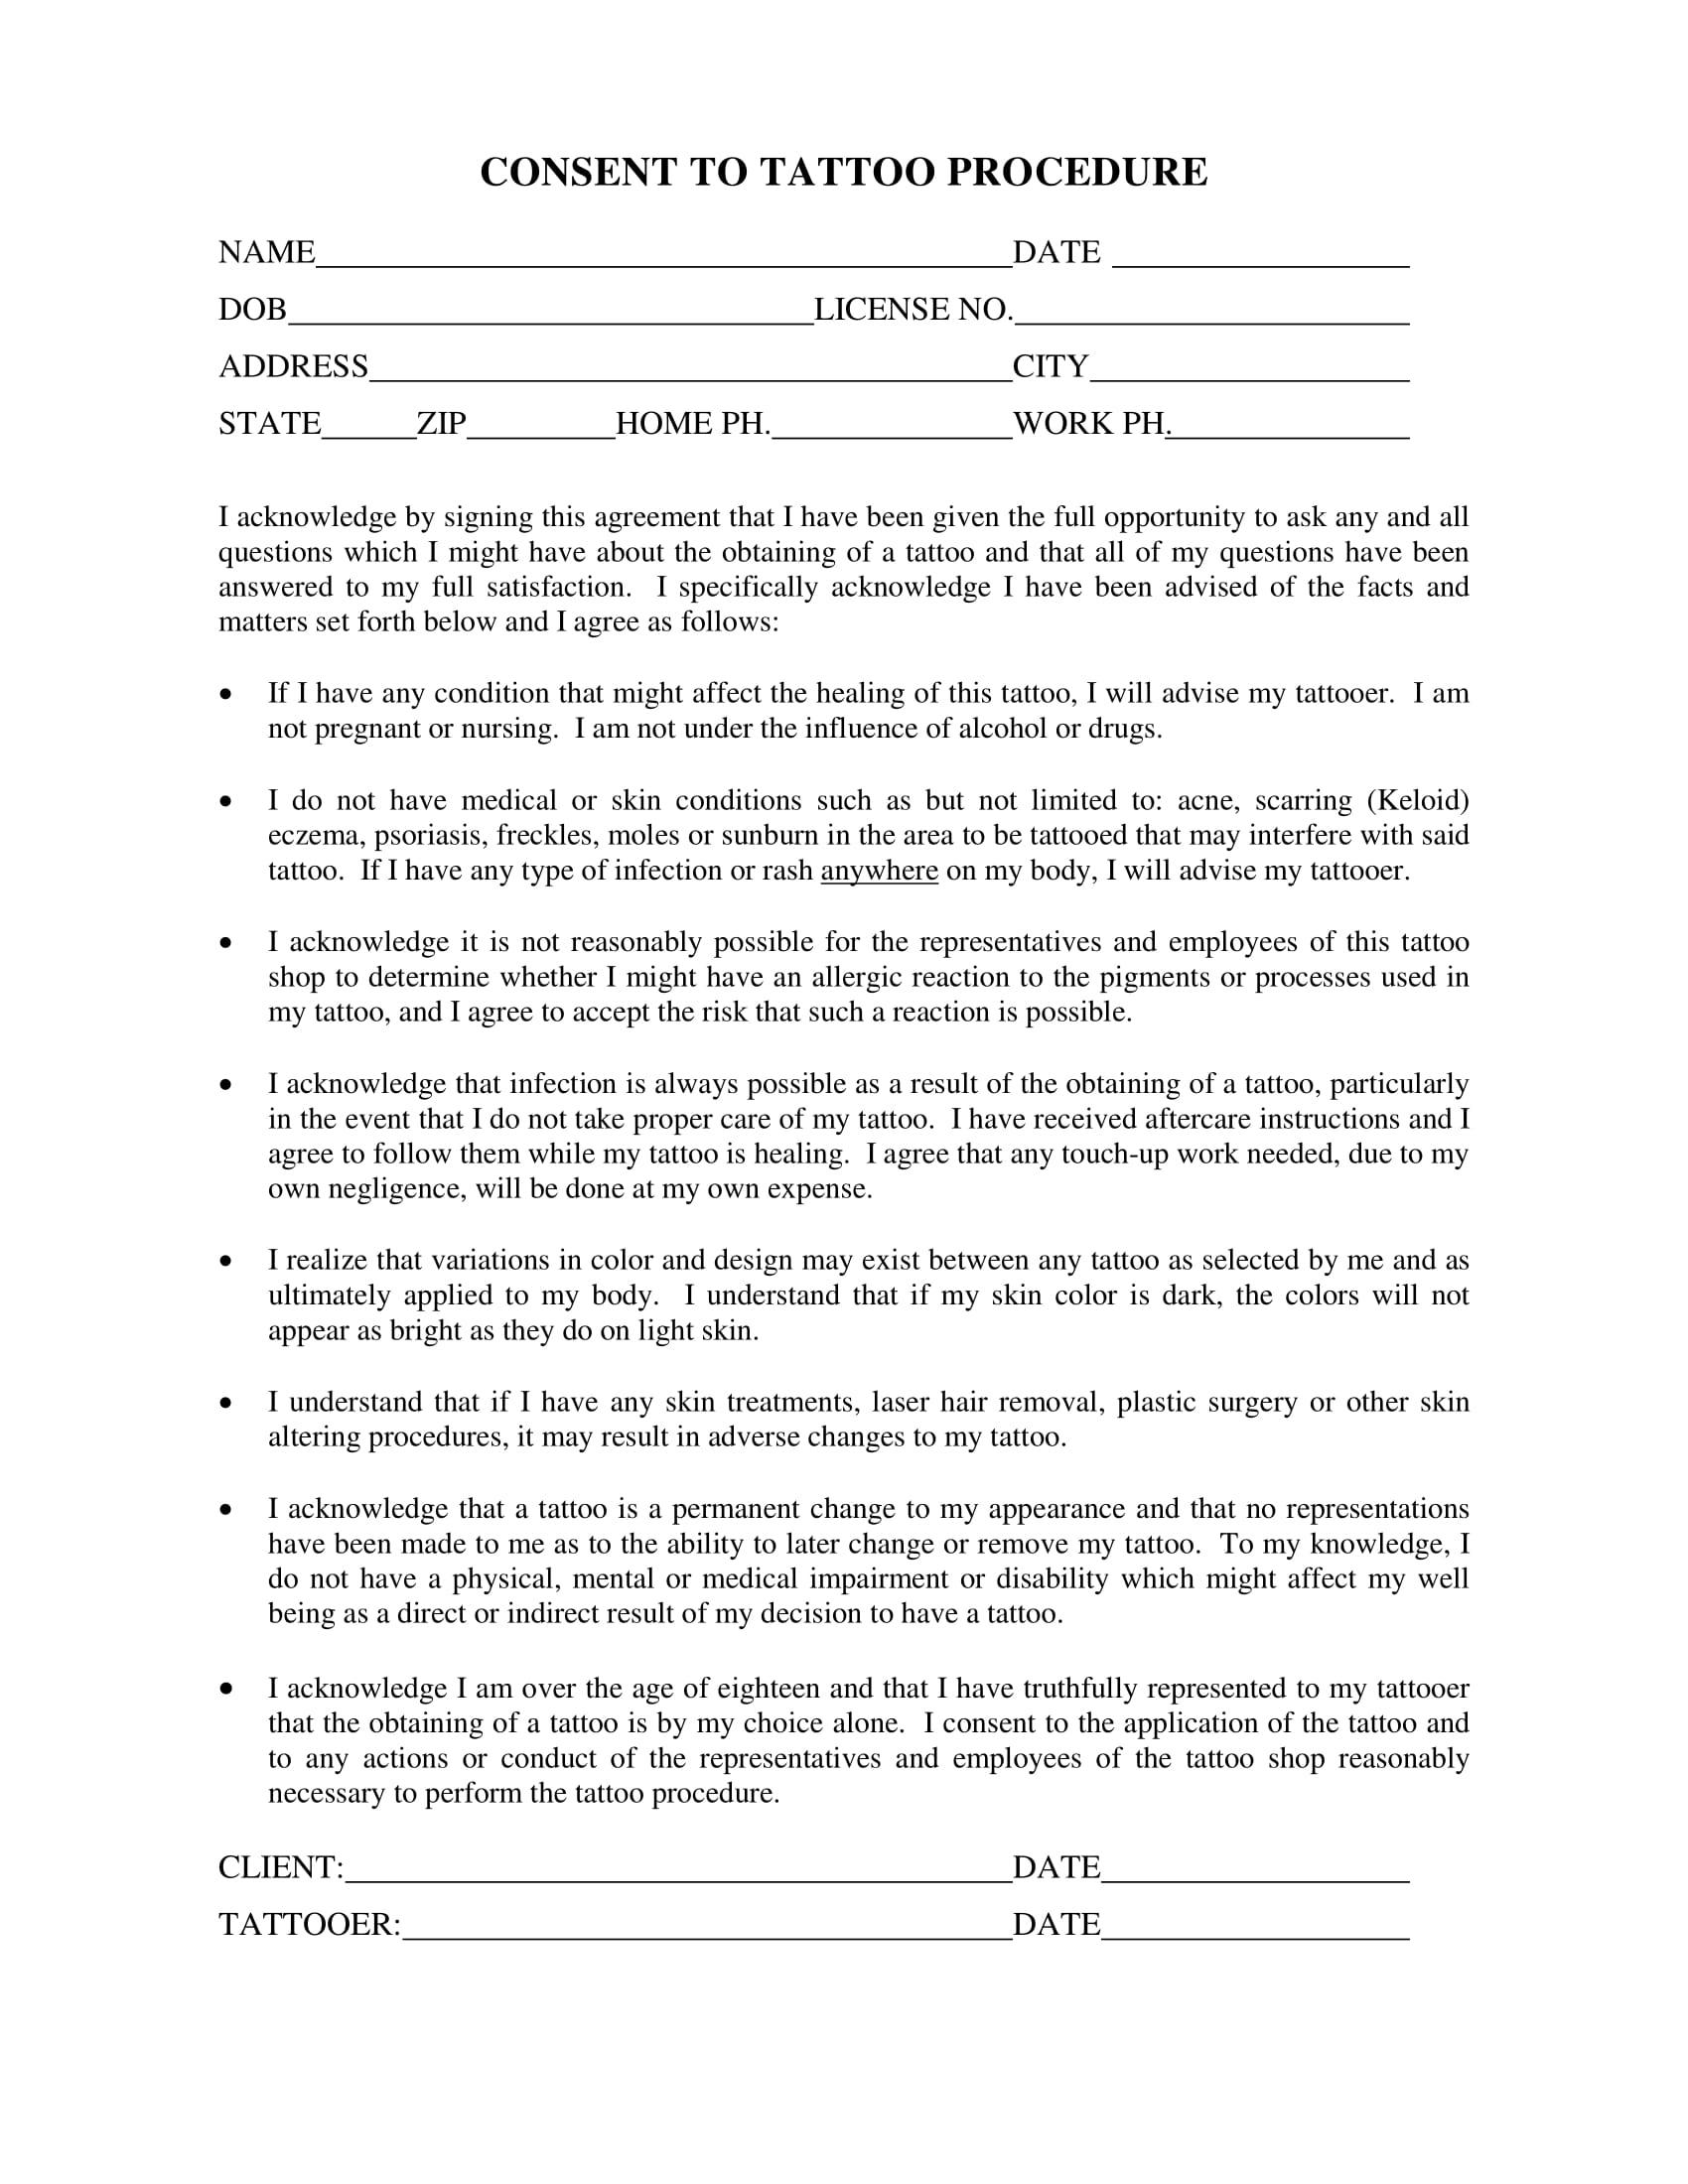 tattoo procedure consent form 1